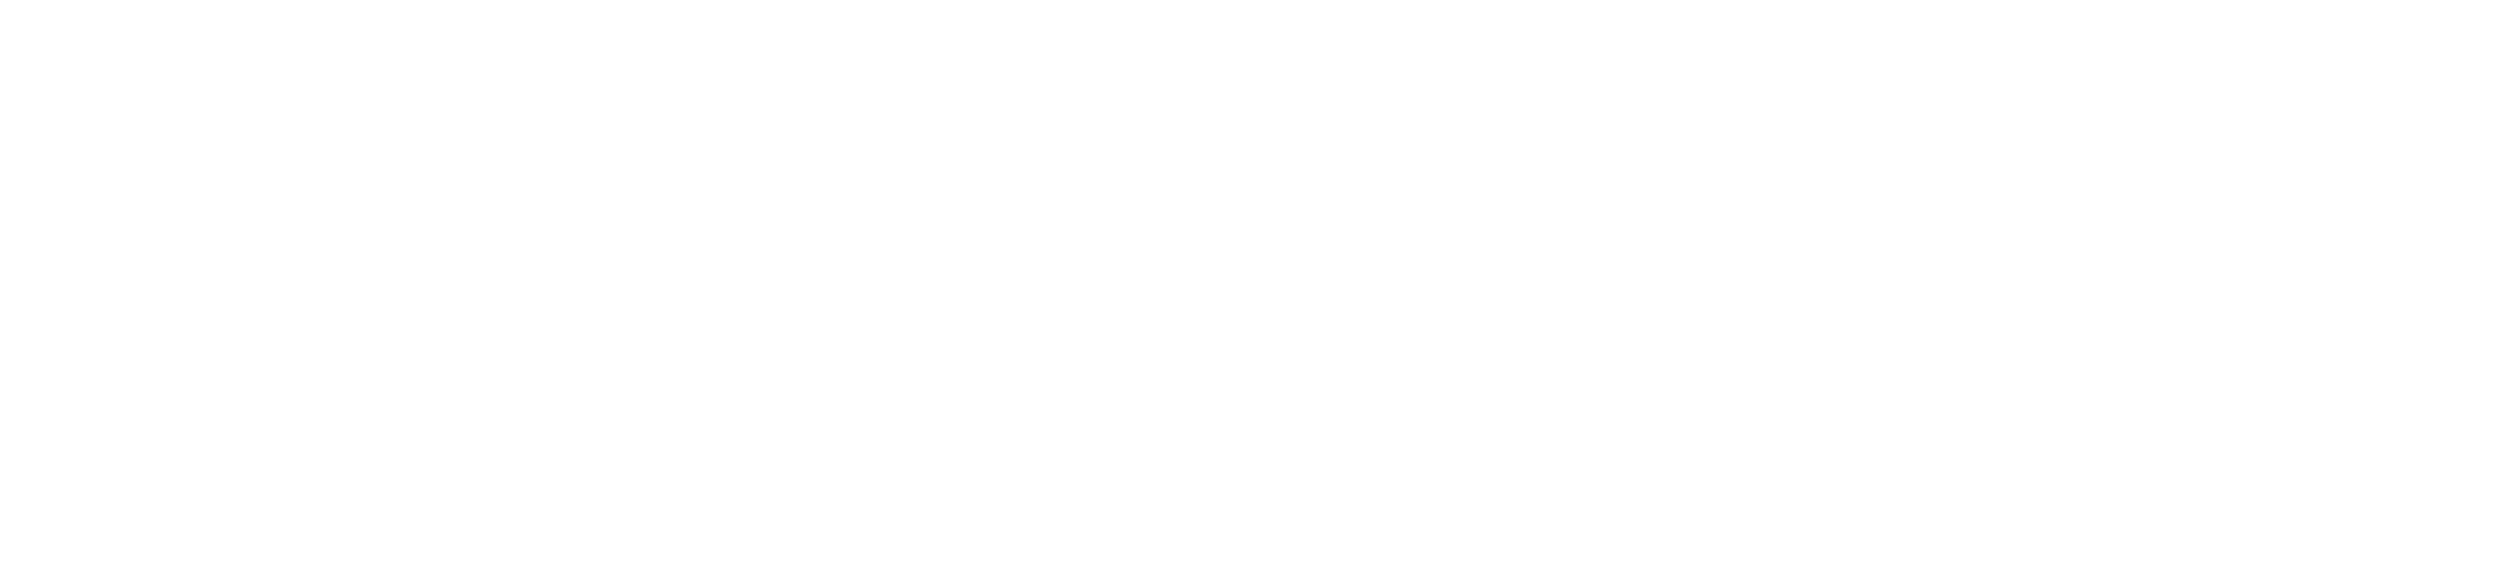 ZCS logo design 2019 website2